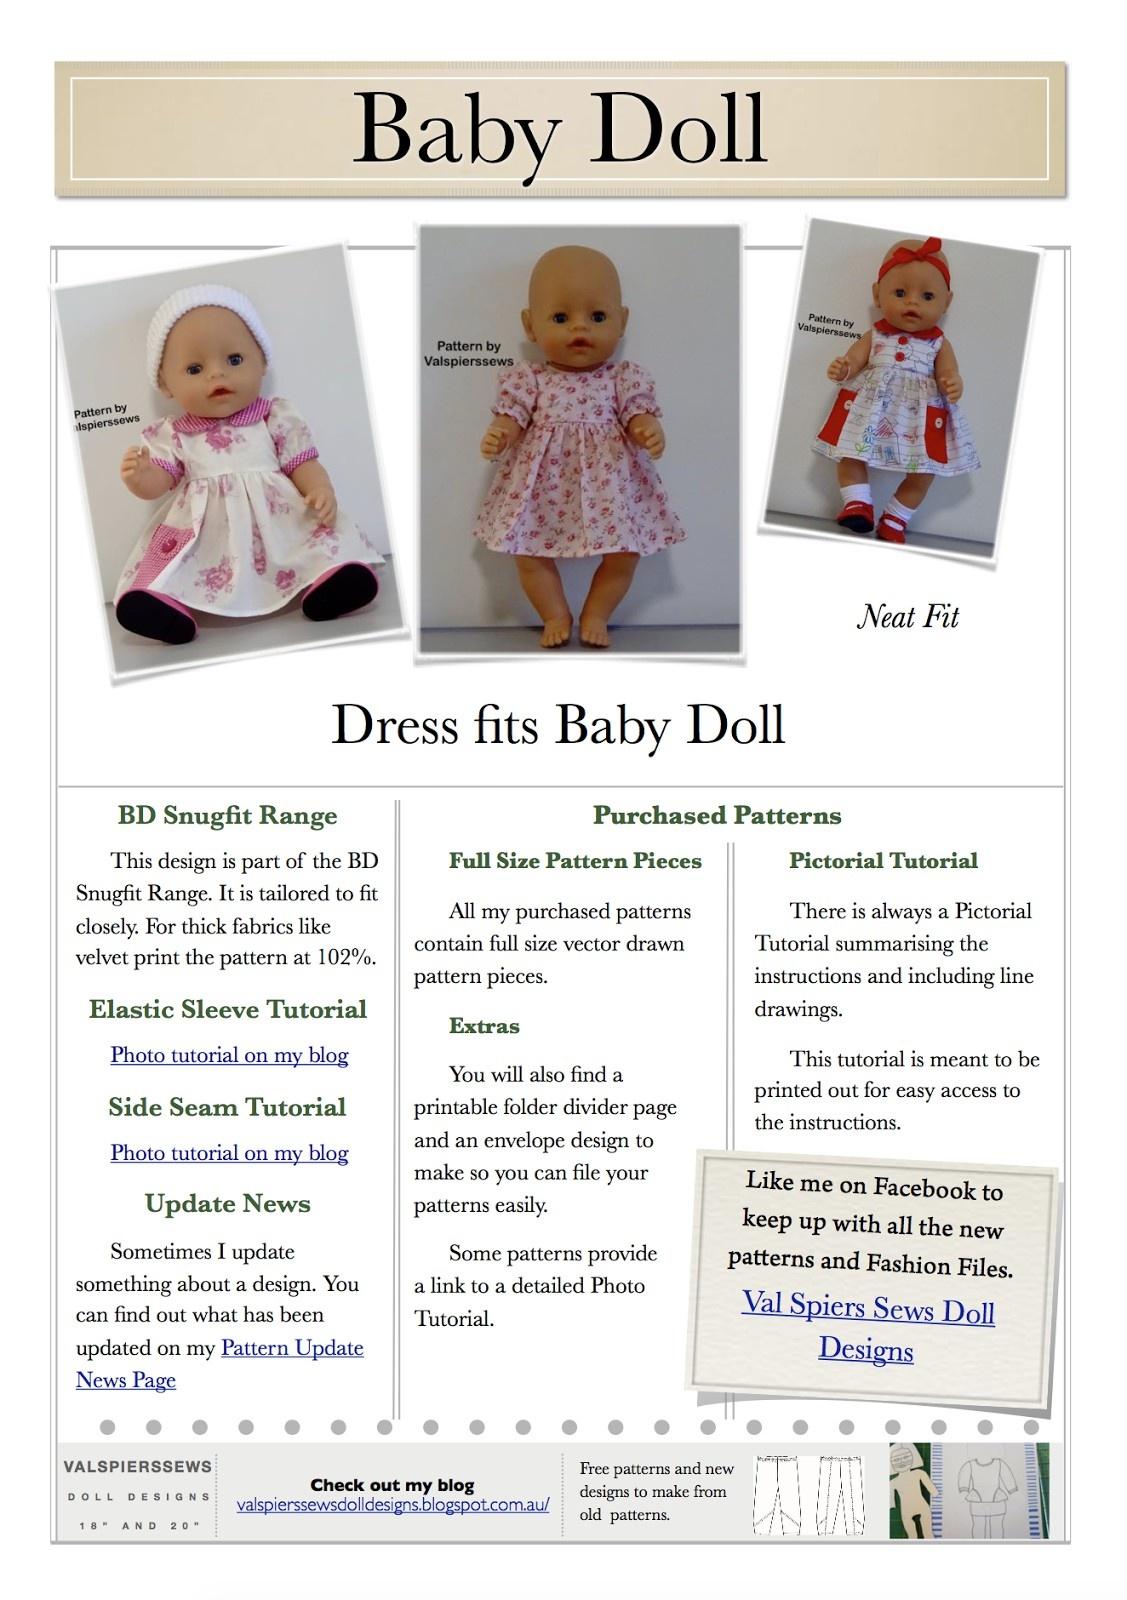 Free Printable American Girl Doll Clothes Patterns Lovely Doll - American Girl Doll Clothes Patterns Free Printable